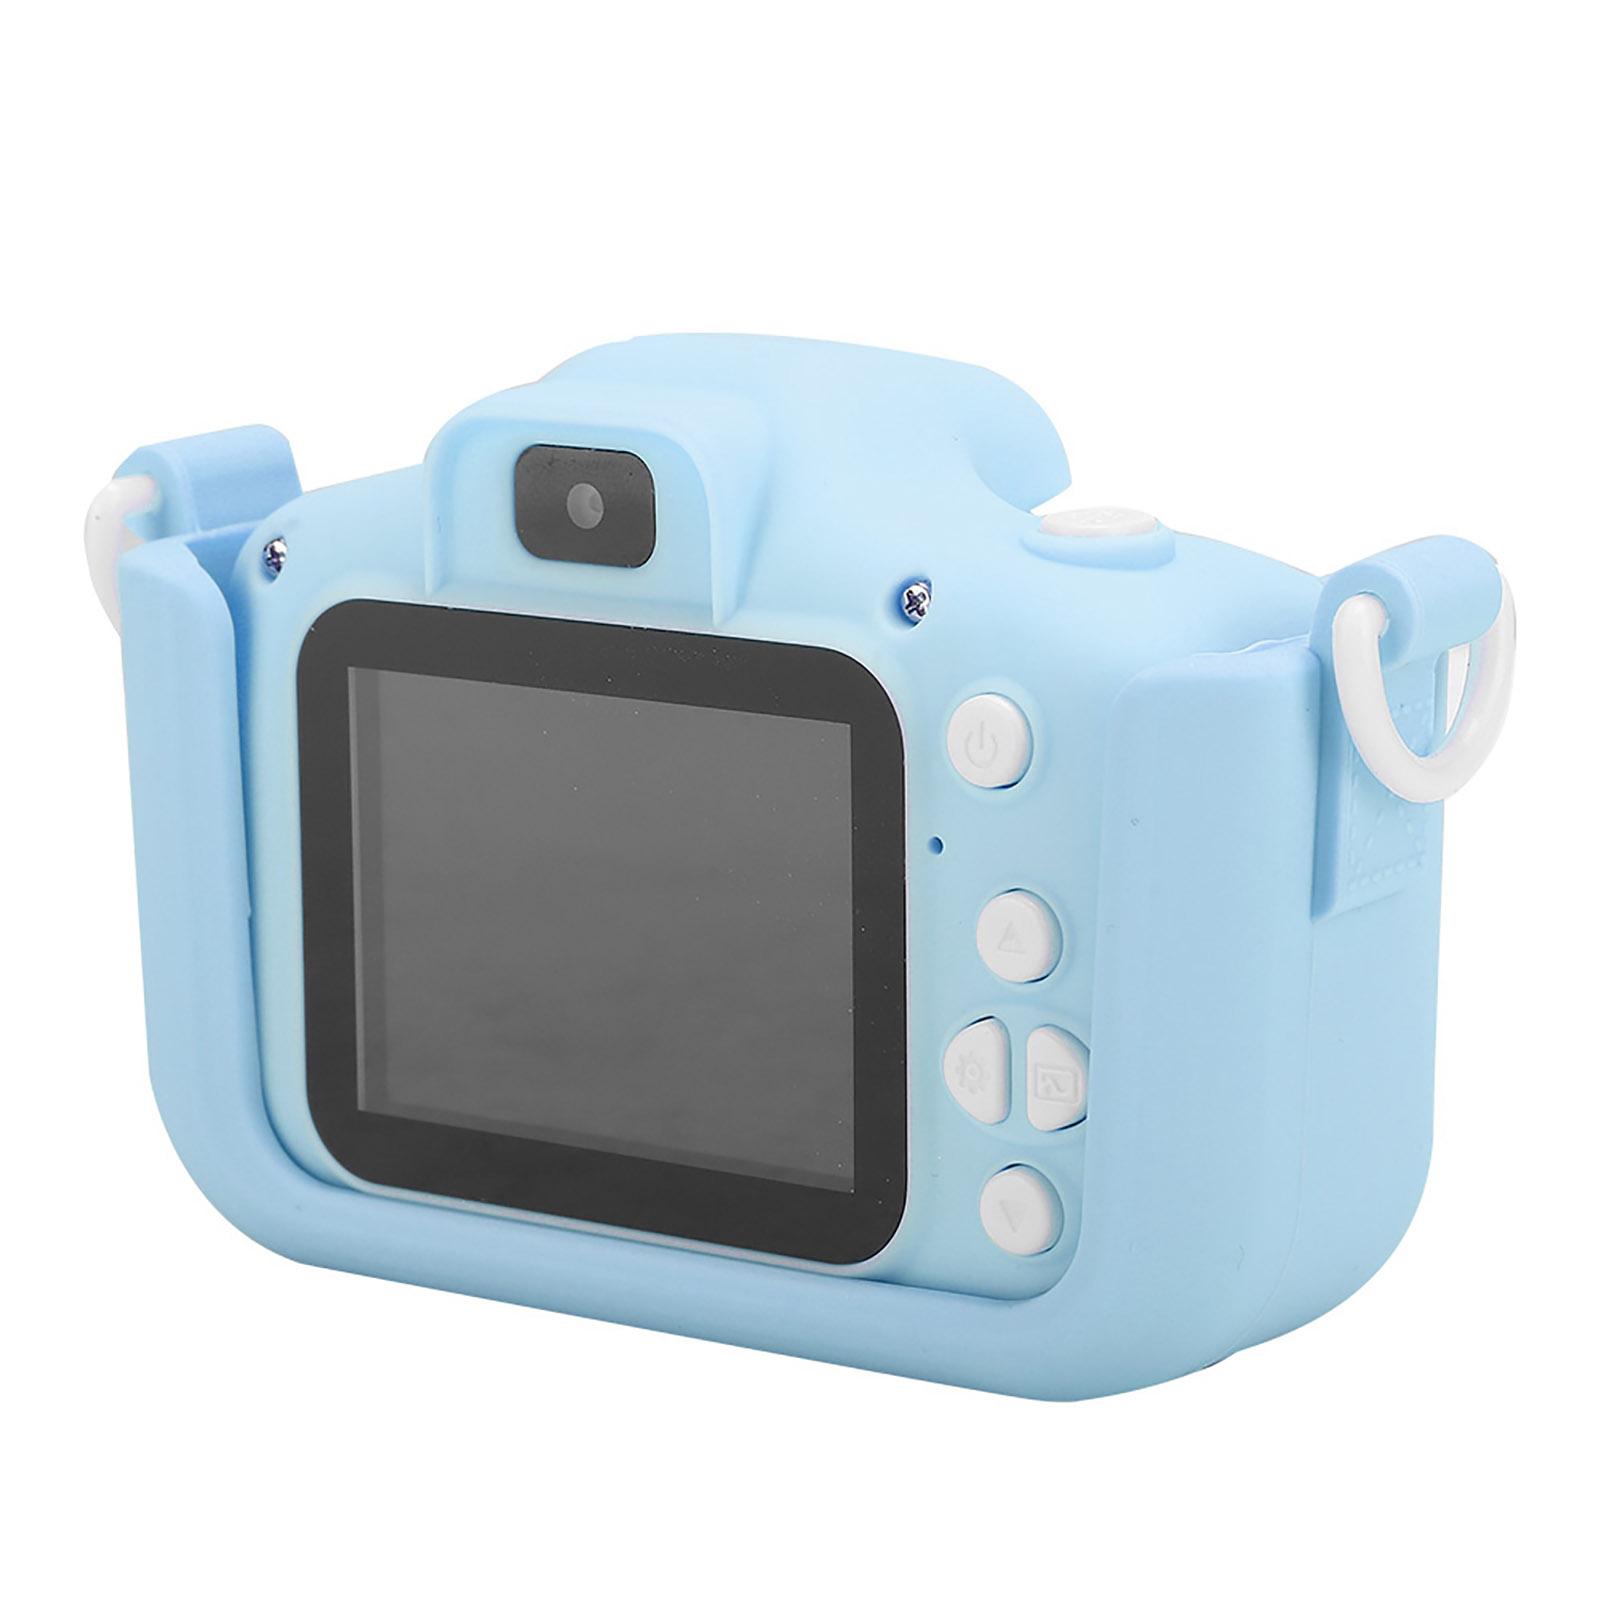 Portable Children Digital Video Camera 2.0in TFT Screen For Windows ME//2000//2003